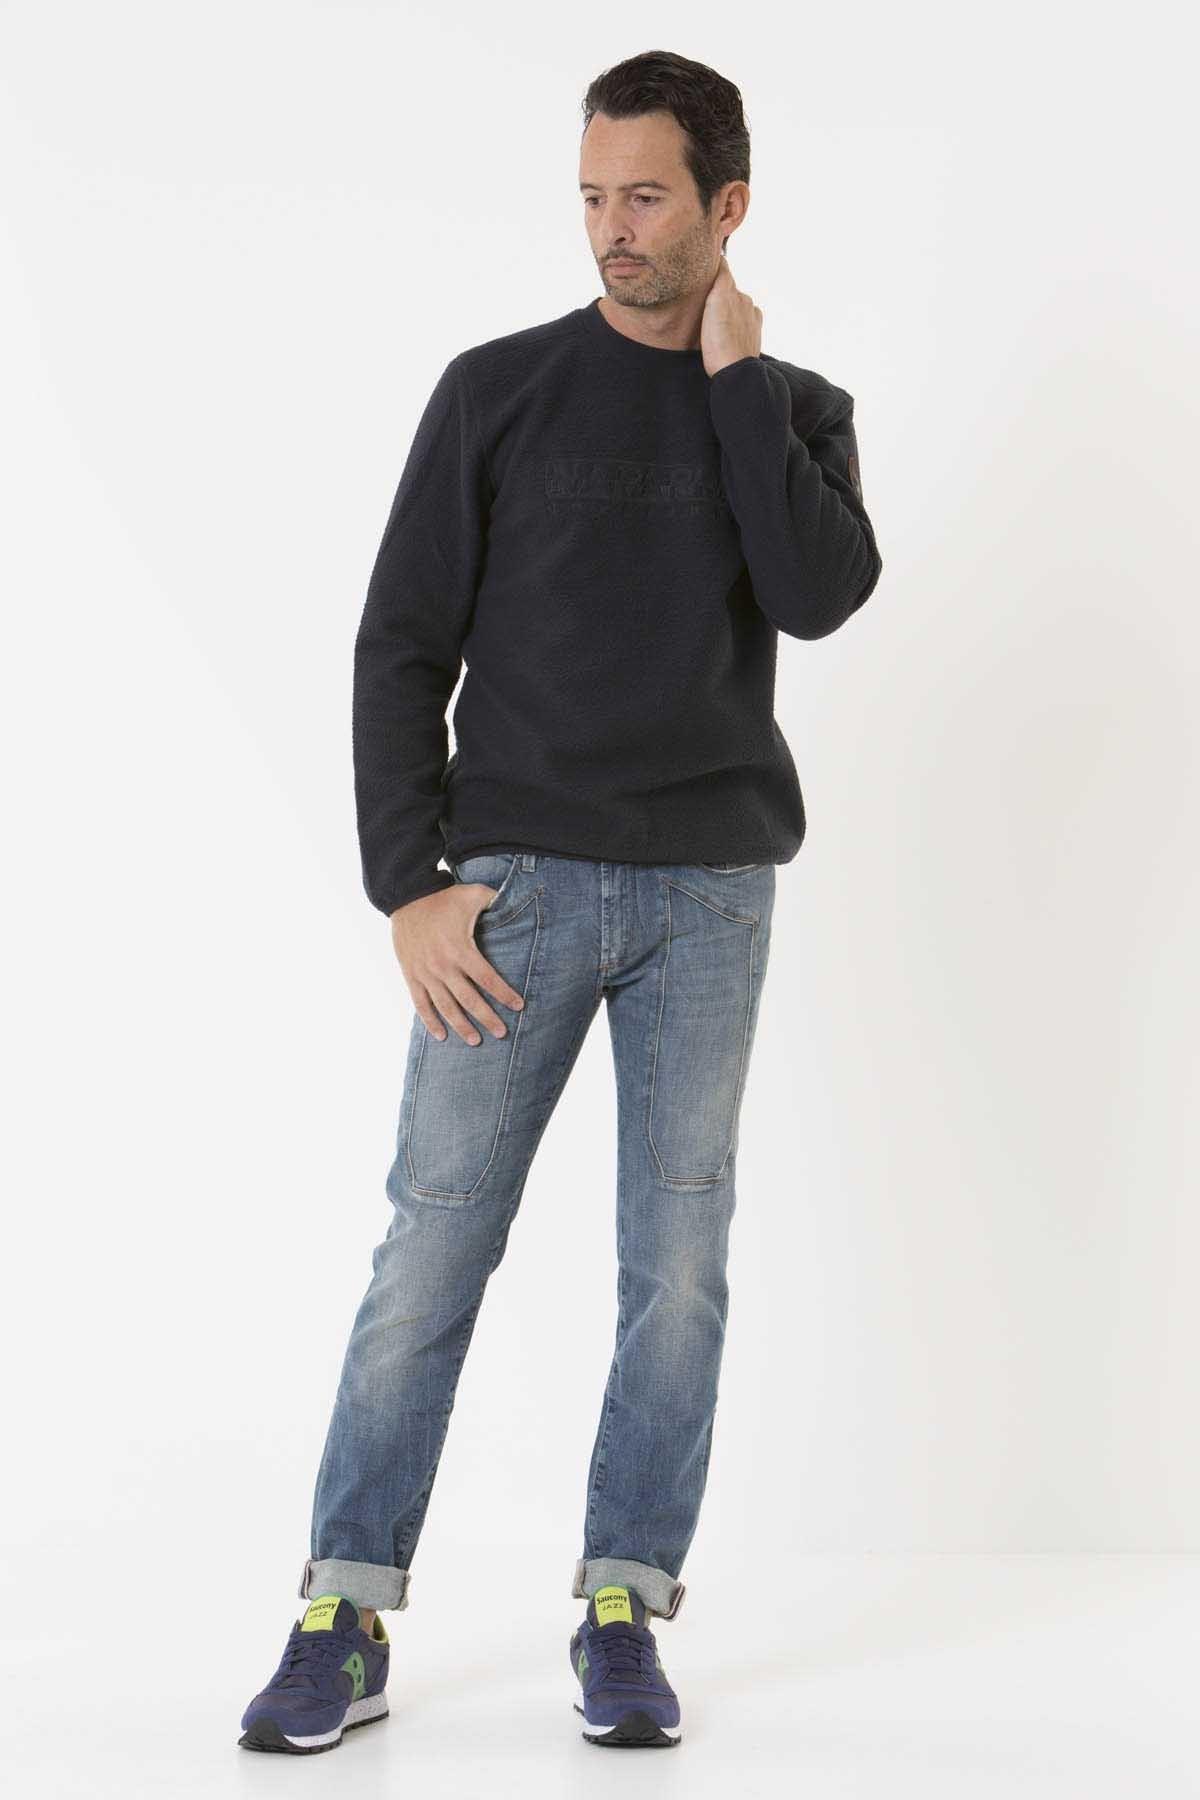 Sweatshirt for man PILE TAME NAPAPIJRI F/W 18-19